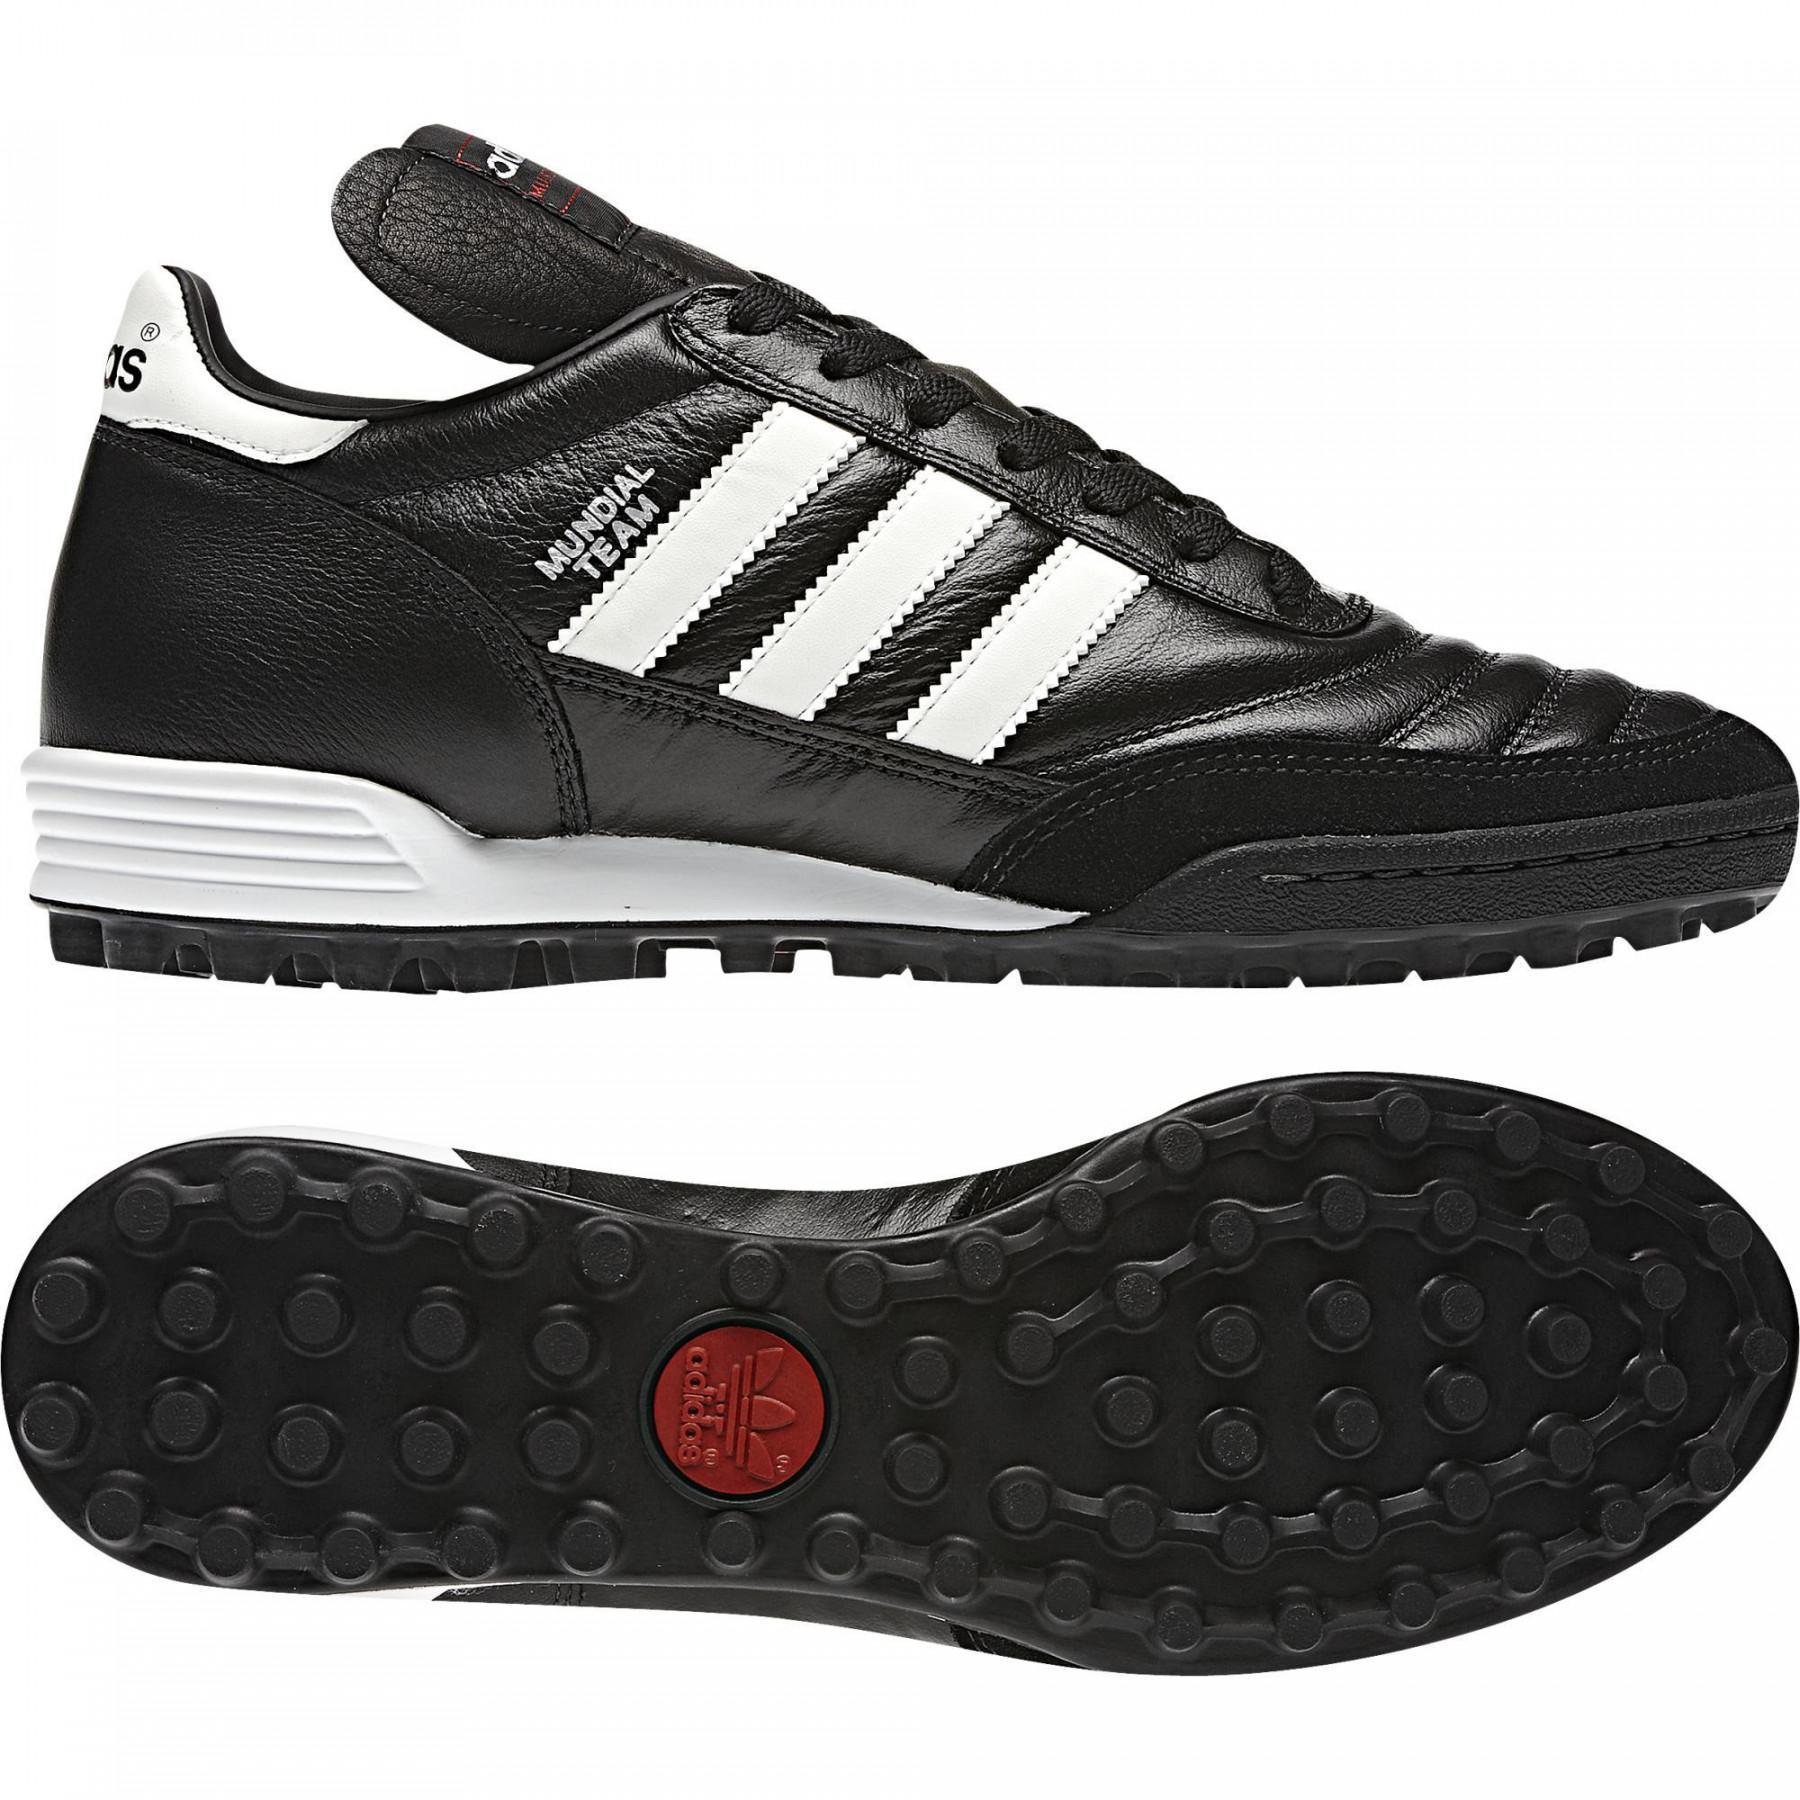 Chaussures adidas Mundial Team